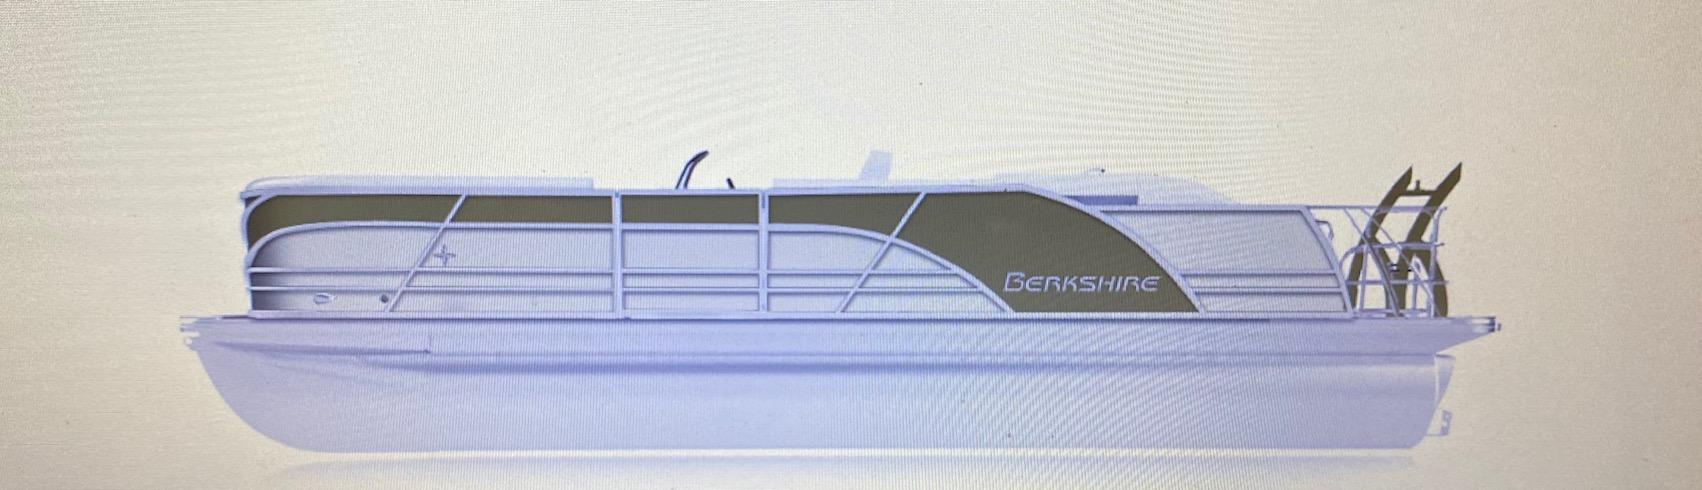 2021 BERKSHIRE STS Entertainment Series 23SB2 3.0 Tri-toon (On order,